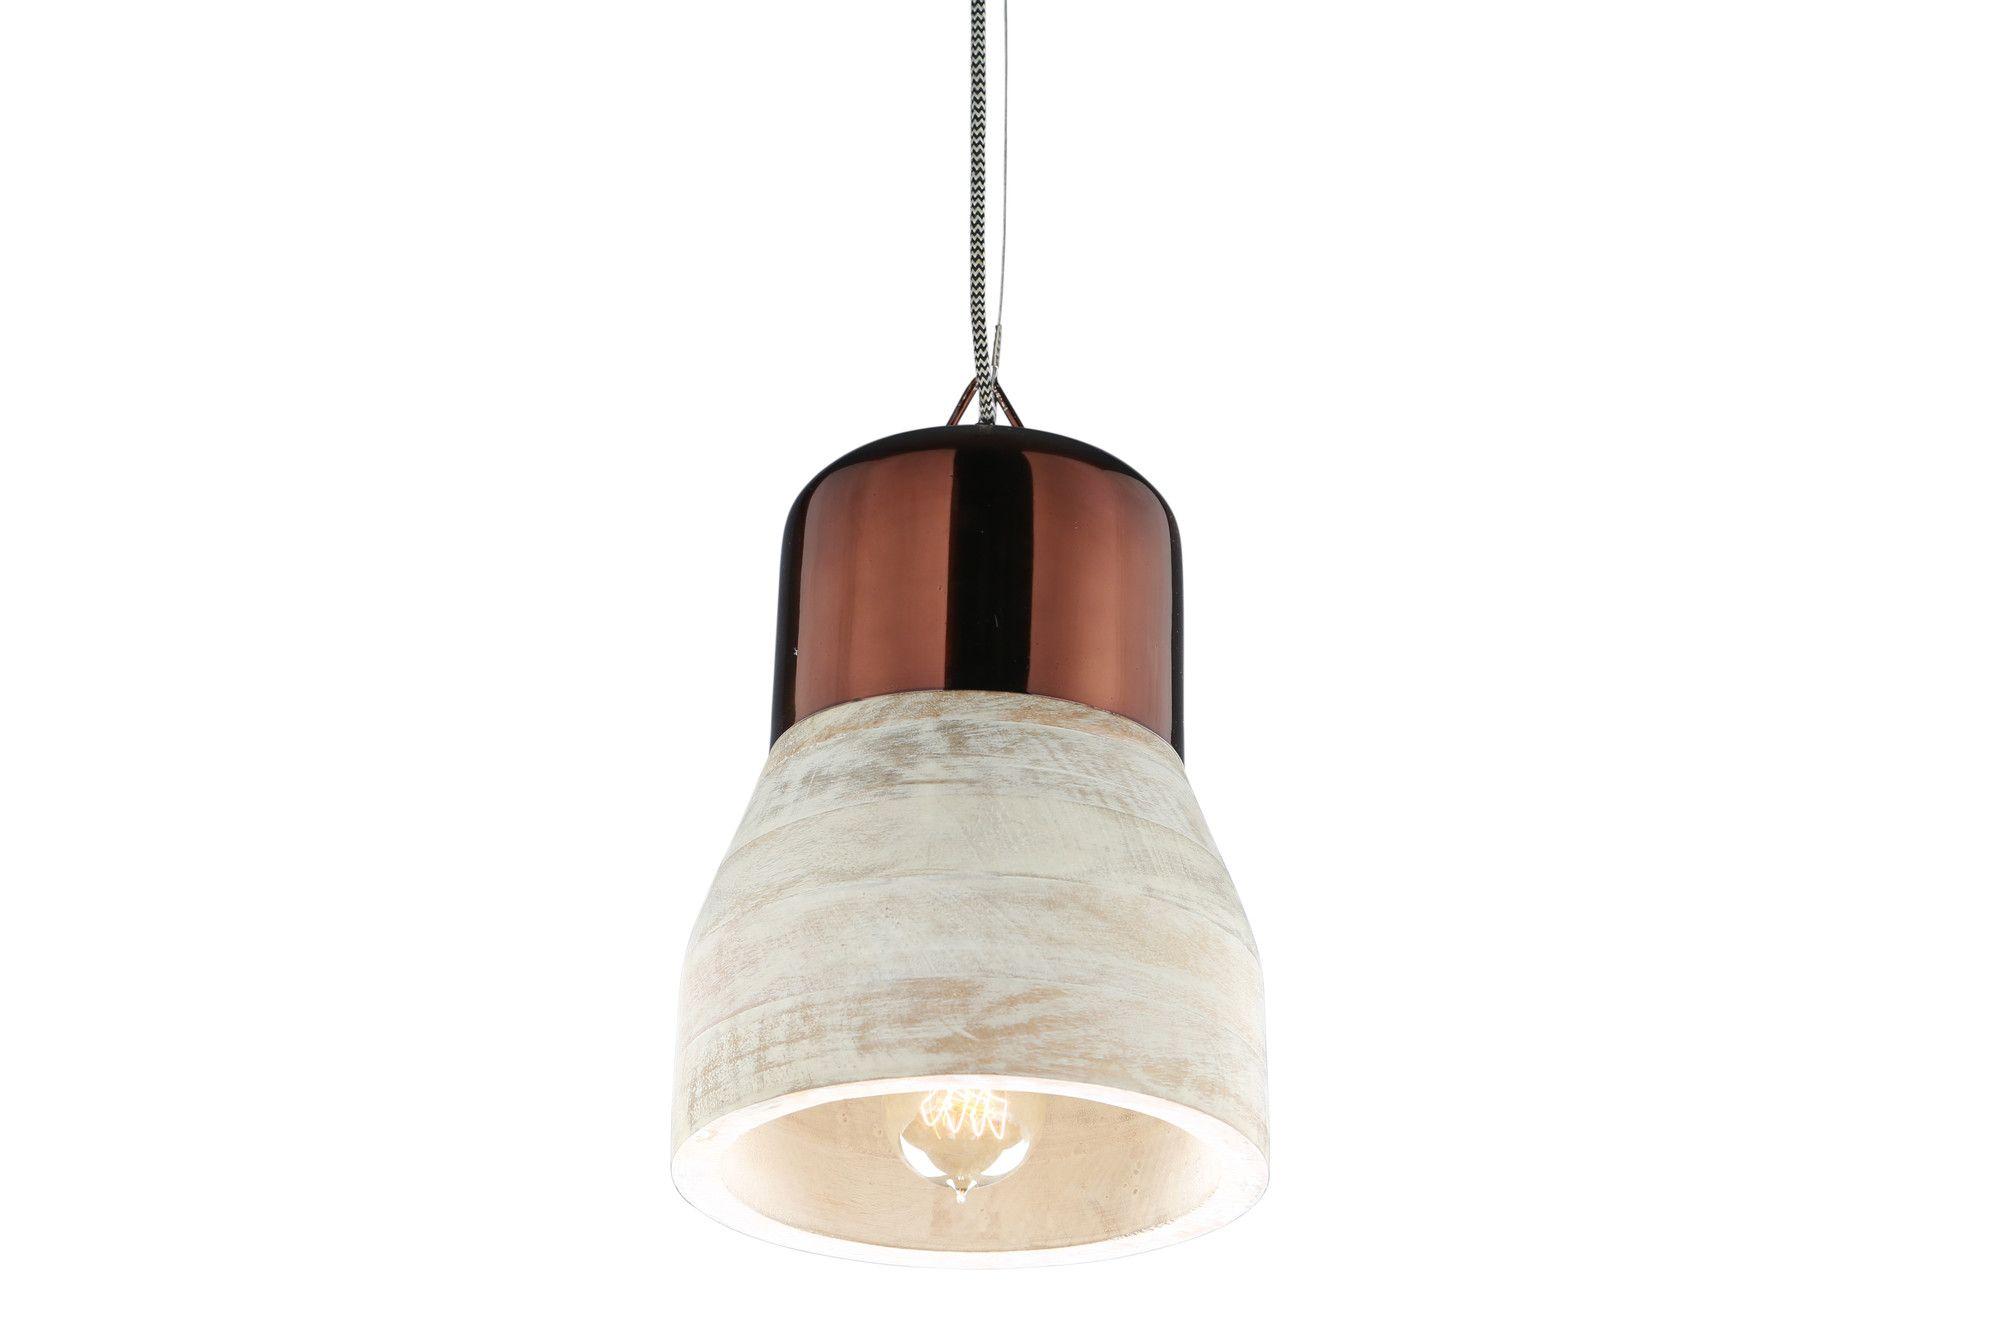 Foreign Affairs Home Decor Prisma 1 Light Pendant Pendant Lighting Bowl Pendant Contemporary Pendant Lights